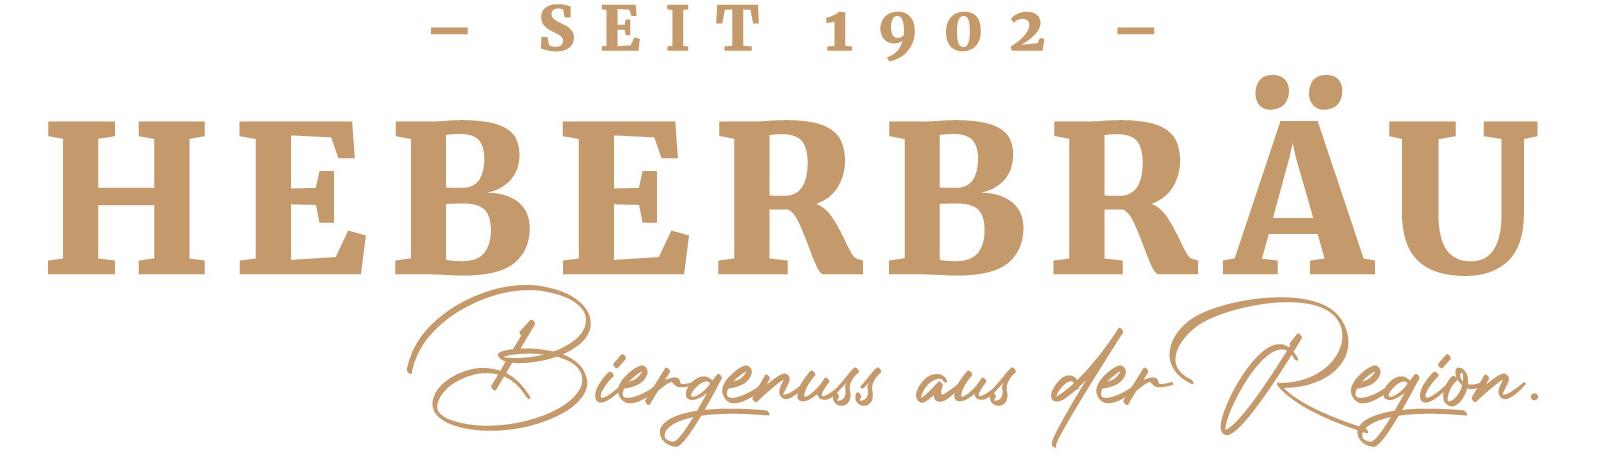 Getränkekarte | Heberbräu